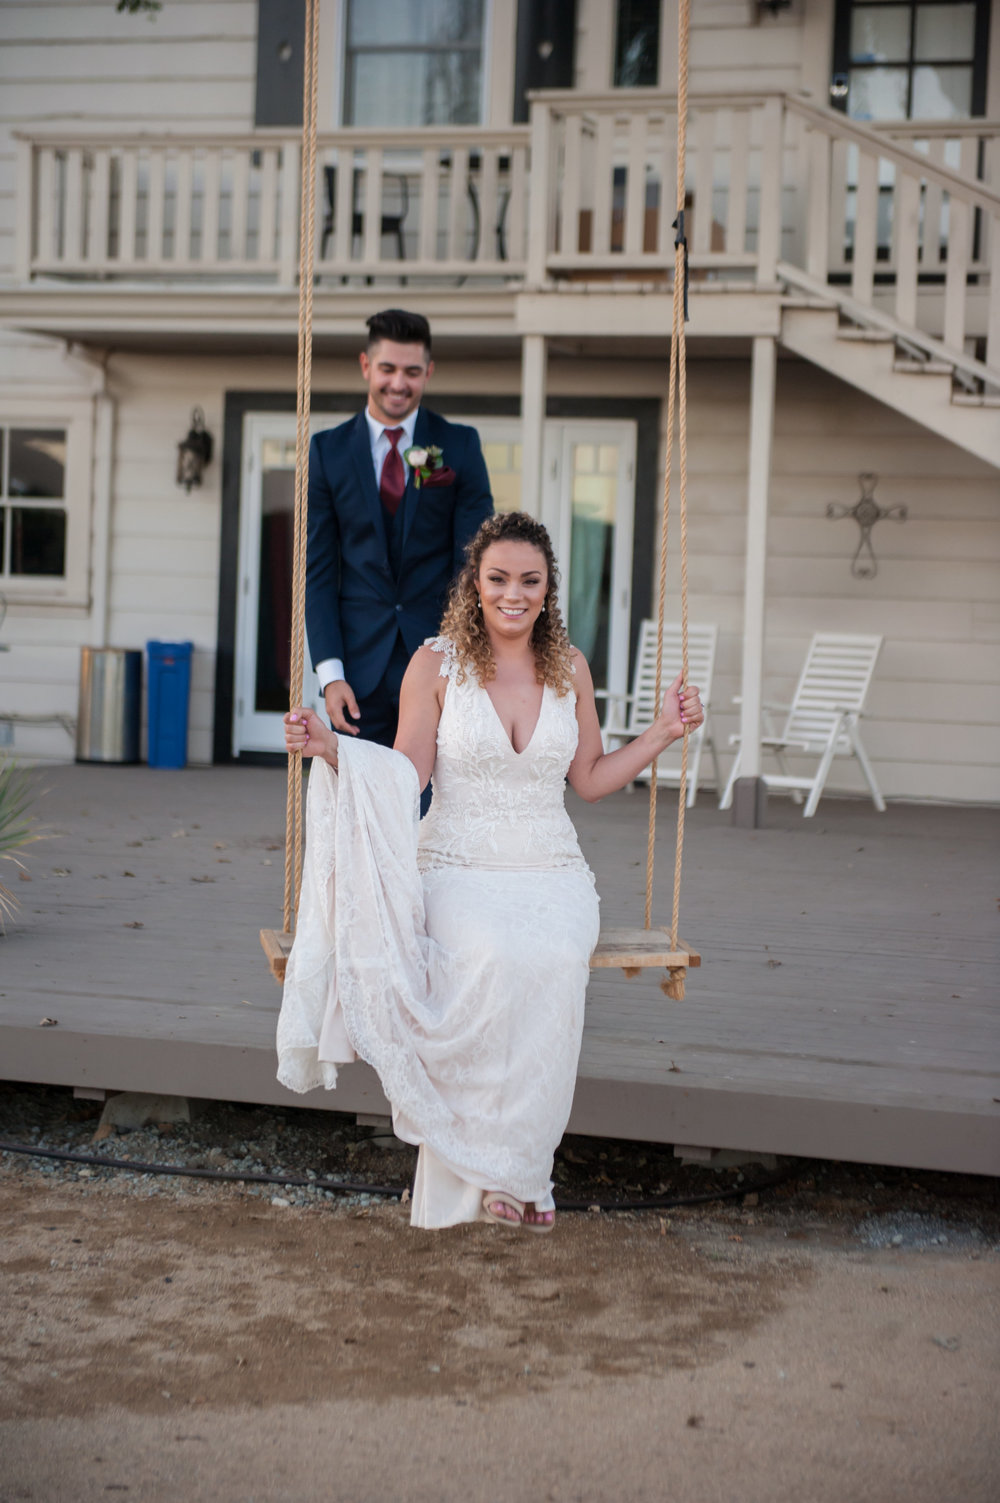 jen vazquez wedding photography Fitz place bride on swing